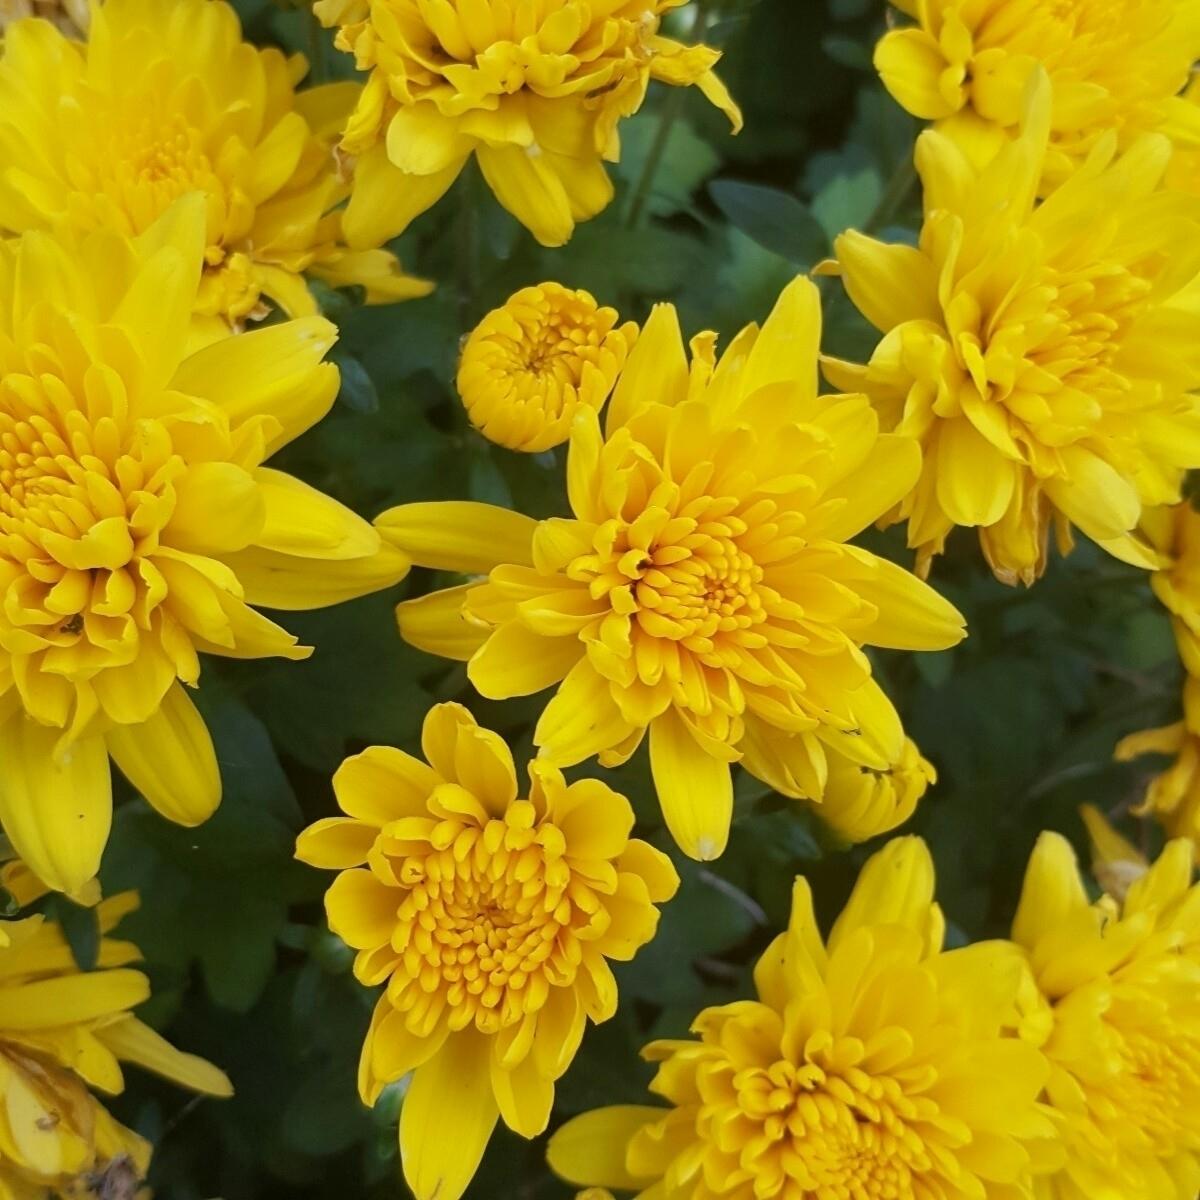 garden calms centers - flowers, spring - mysticearth | ello